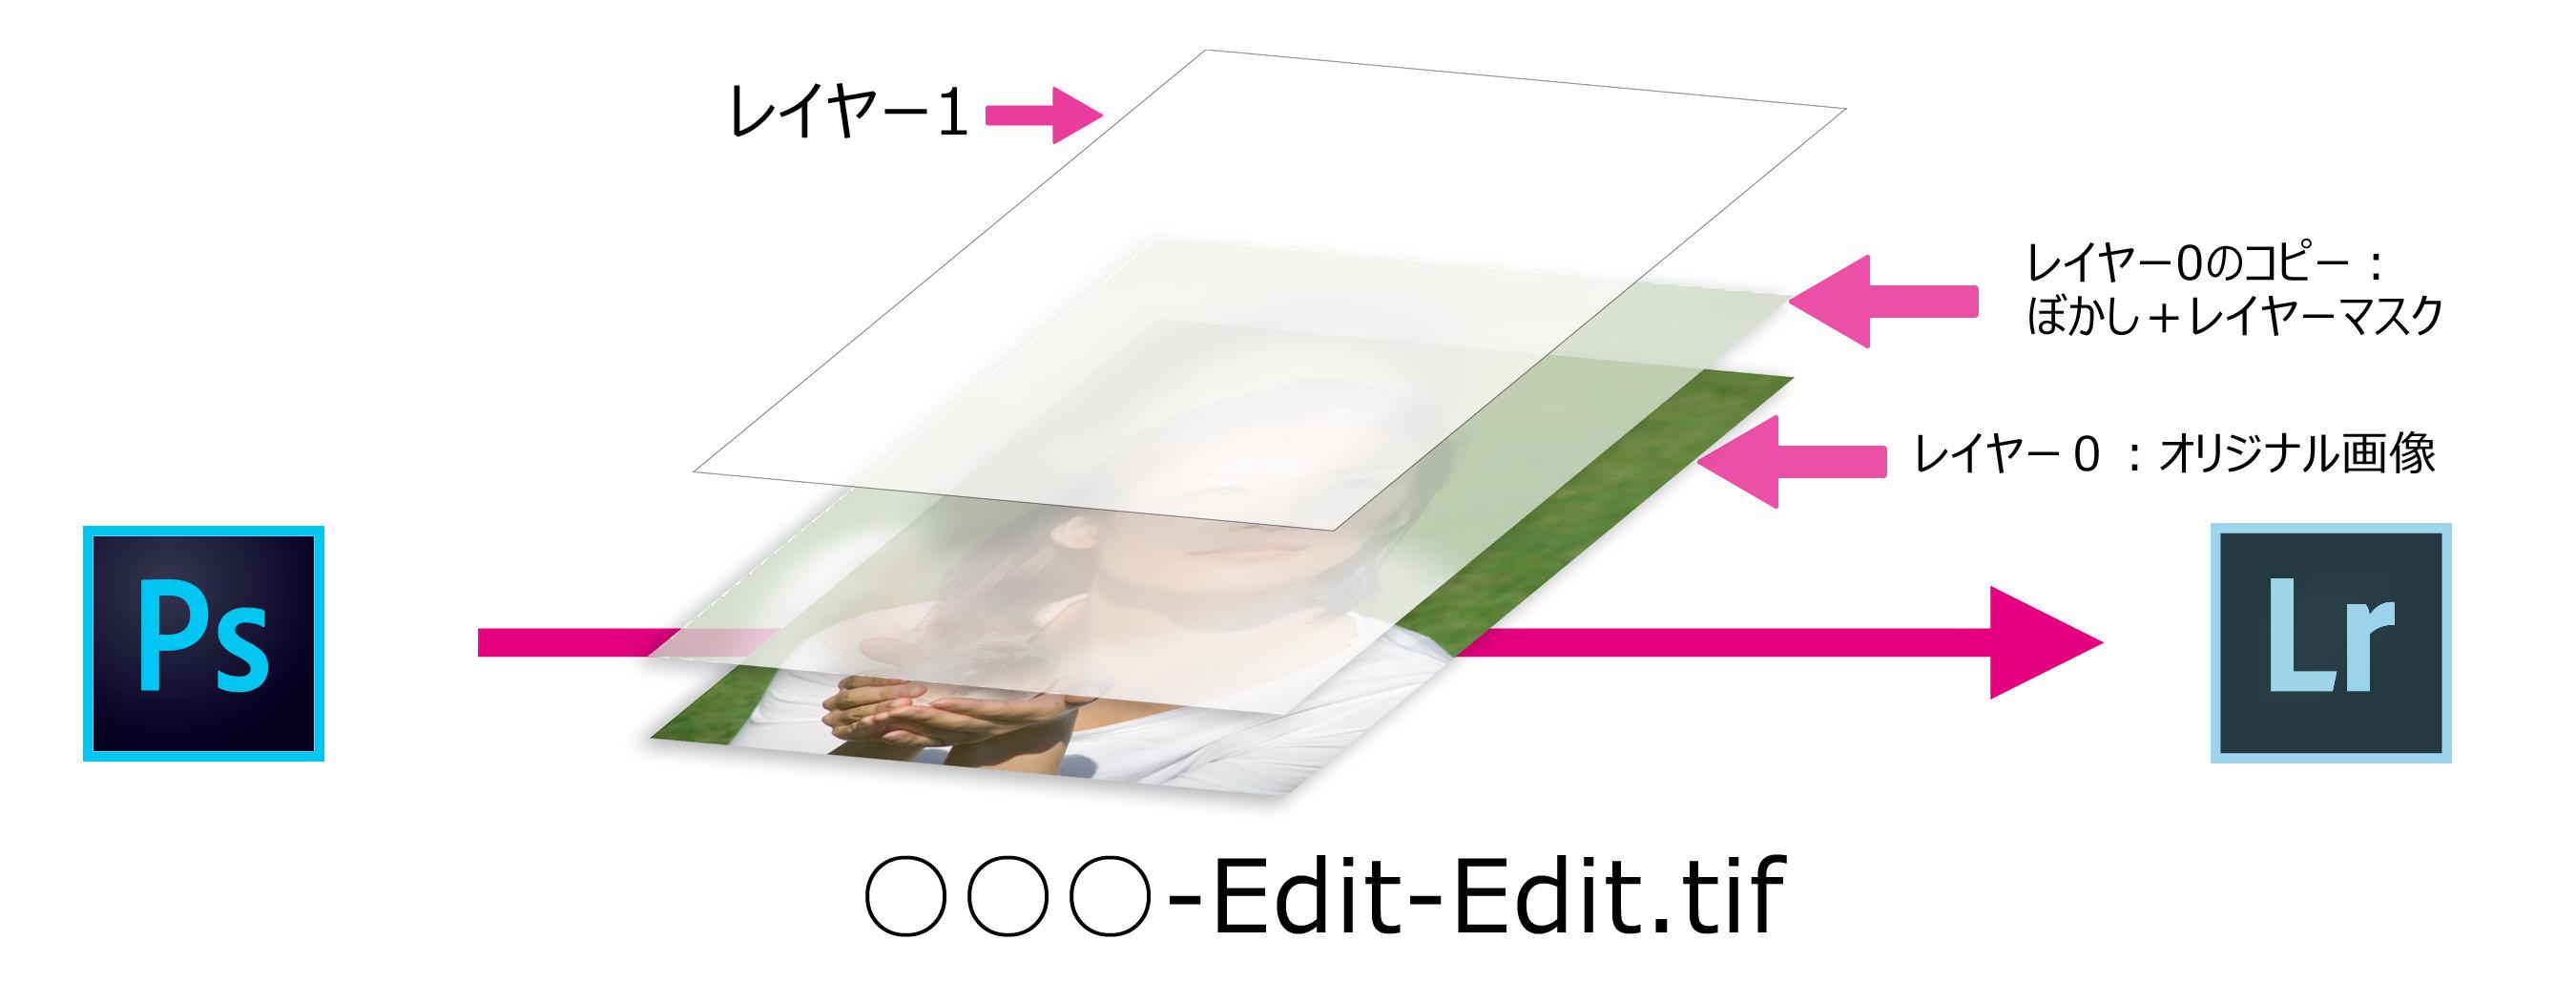 ○○○-Edit-Edit-Case3